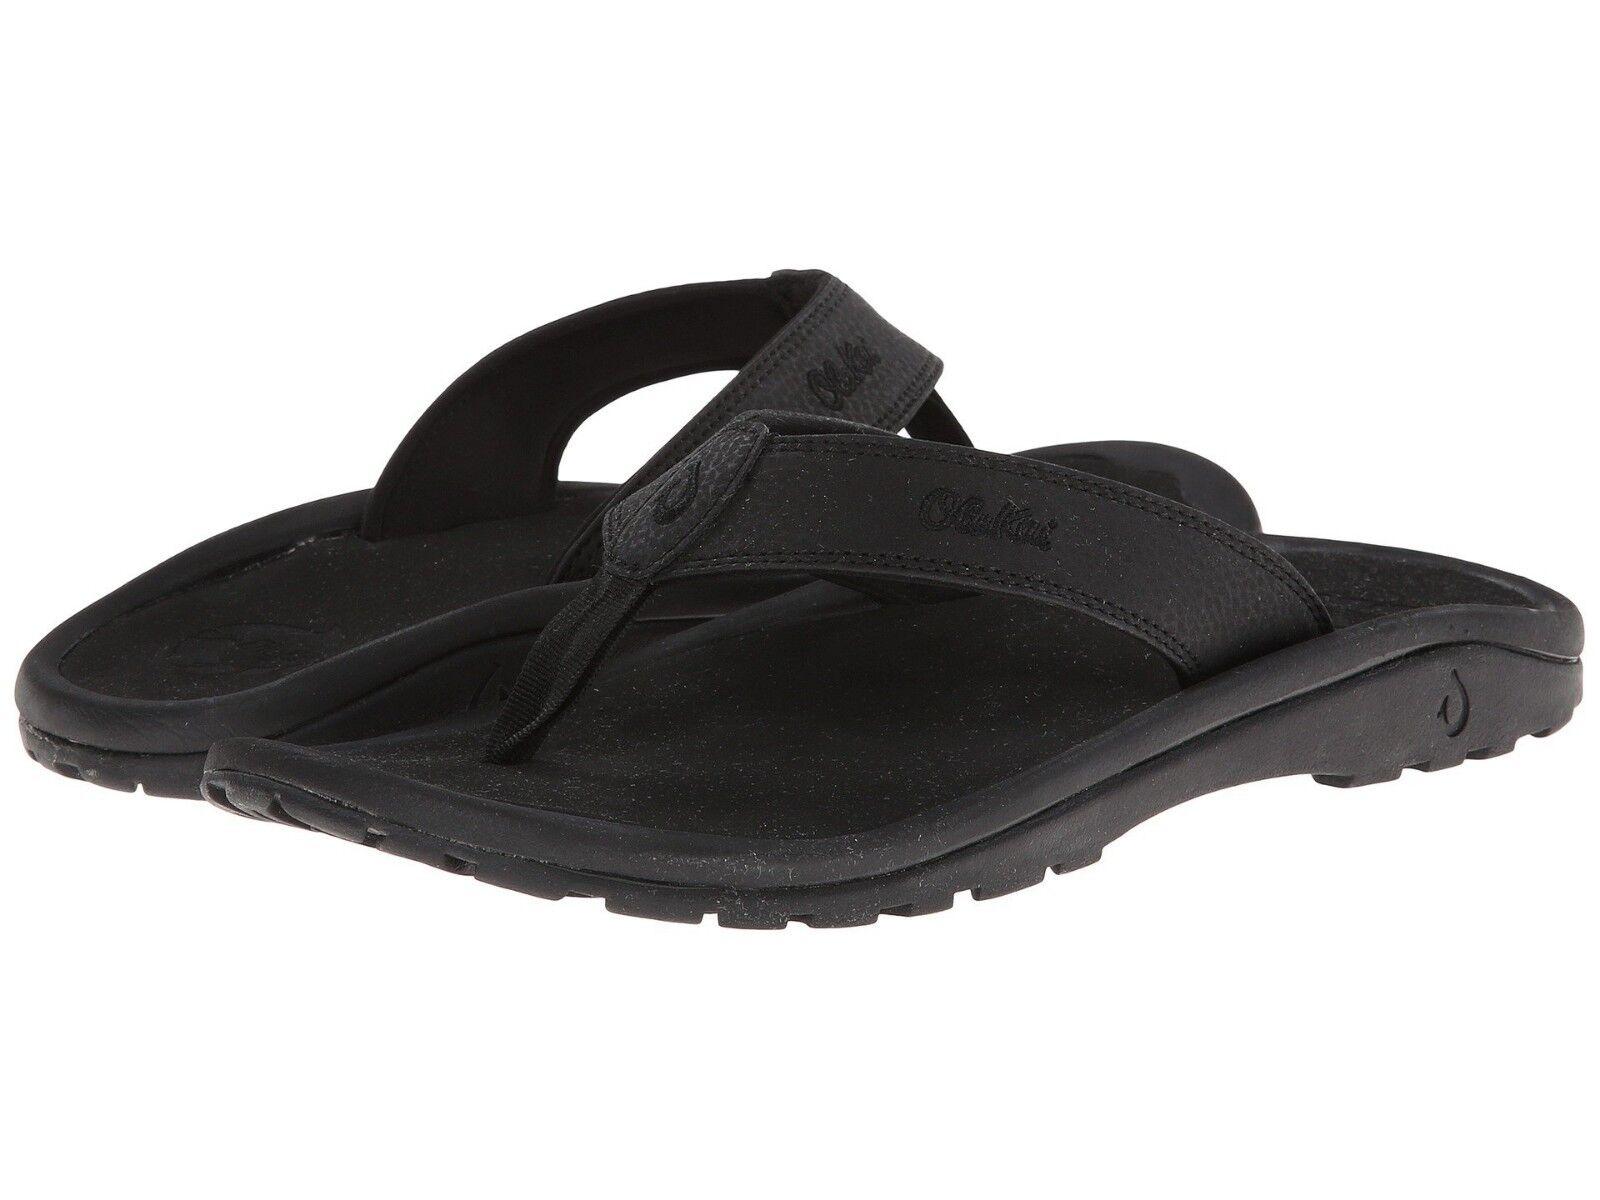 Uomo scarpe OluKai Ohana Casual Sandals Sandals Sandals 10110A-4040 nero New 6b279e